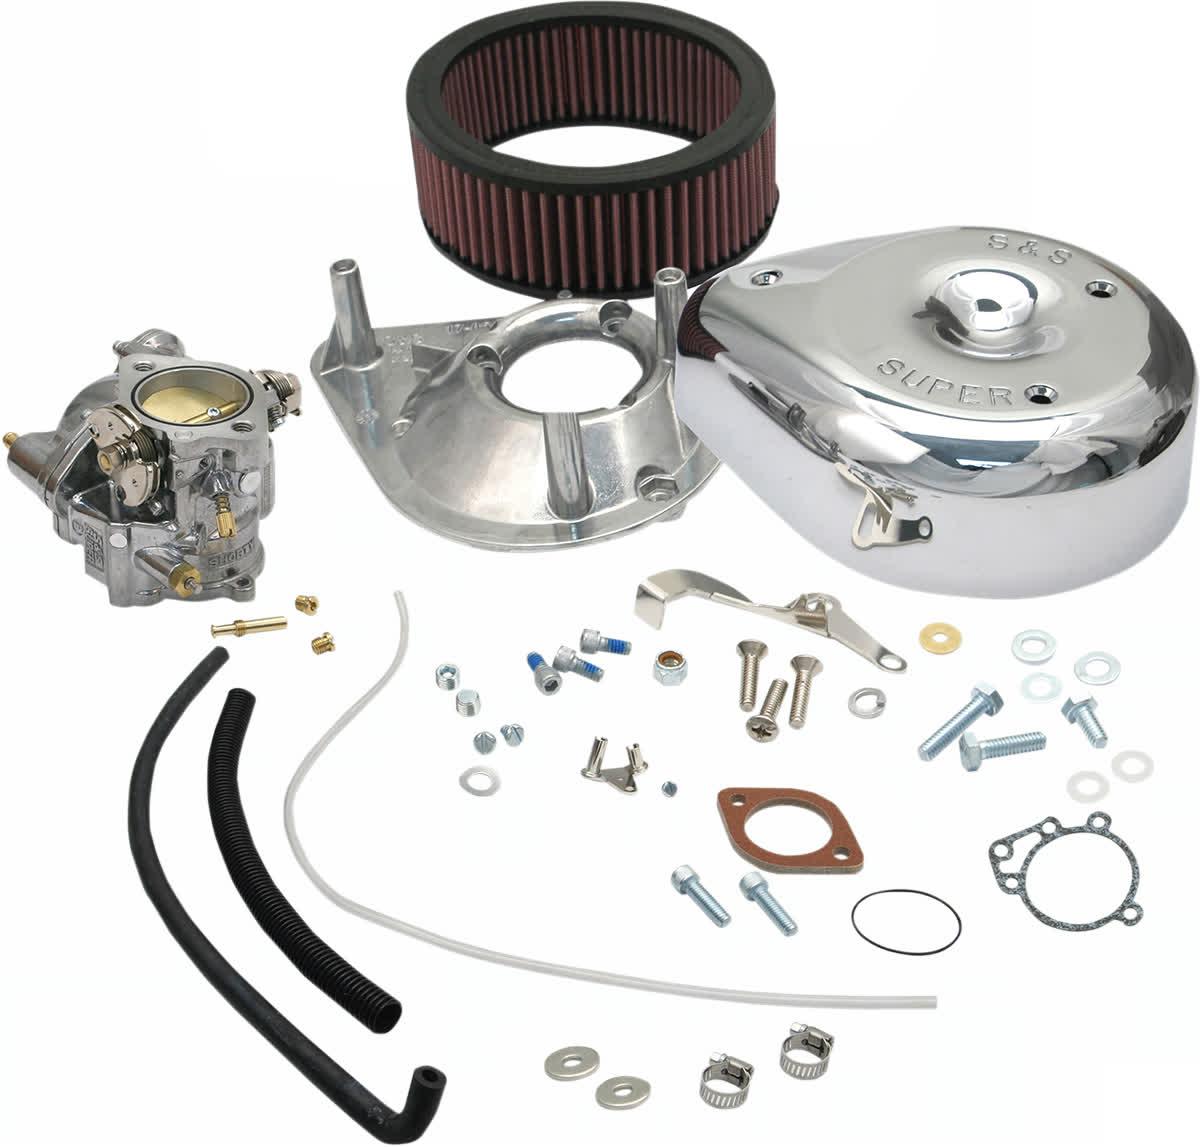 S&S Cycle 11-0412 Shorty Super E Carburetor Kit (No Manifold or Mount)